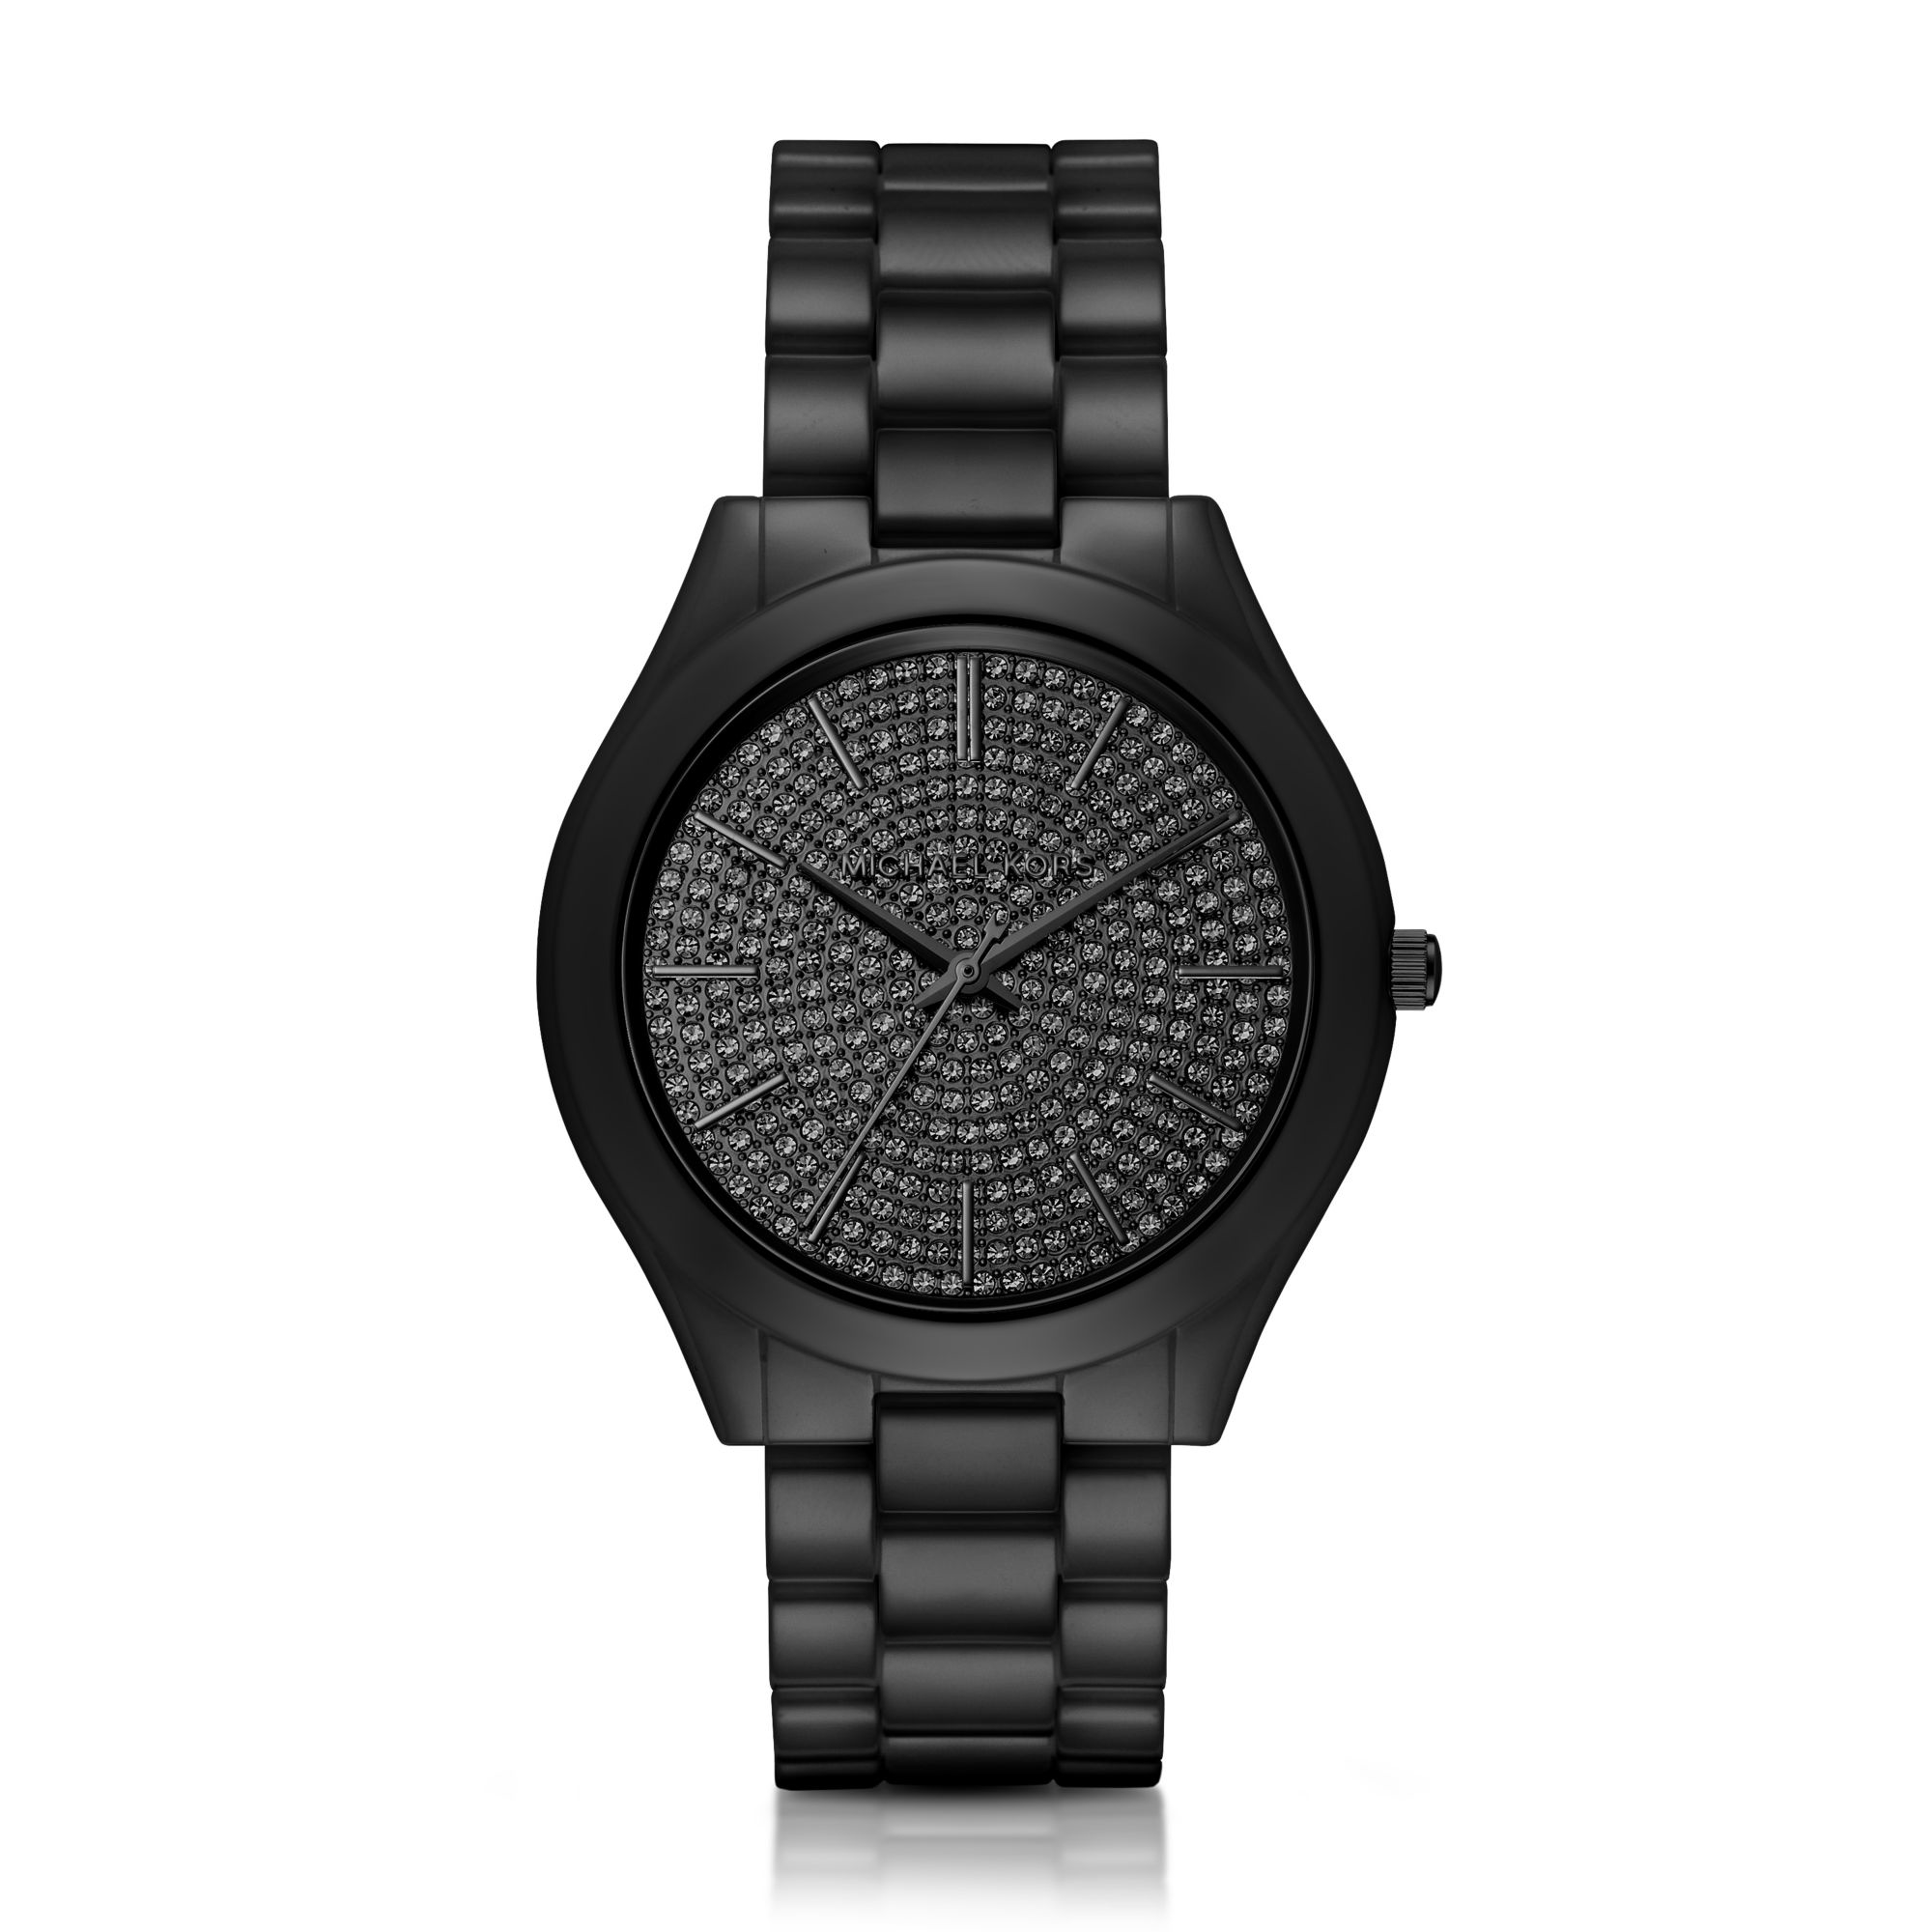 5b9cd851d Michael Kors Slim Runway Pave Black Tone Ceramic Watch In Lyst